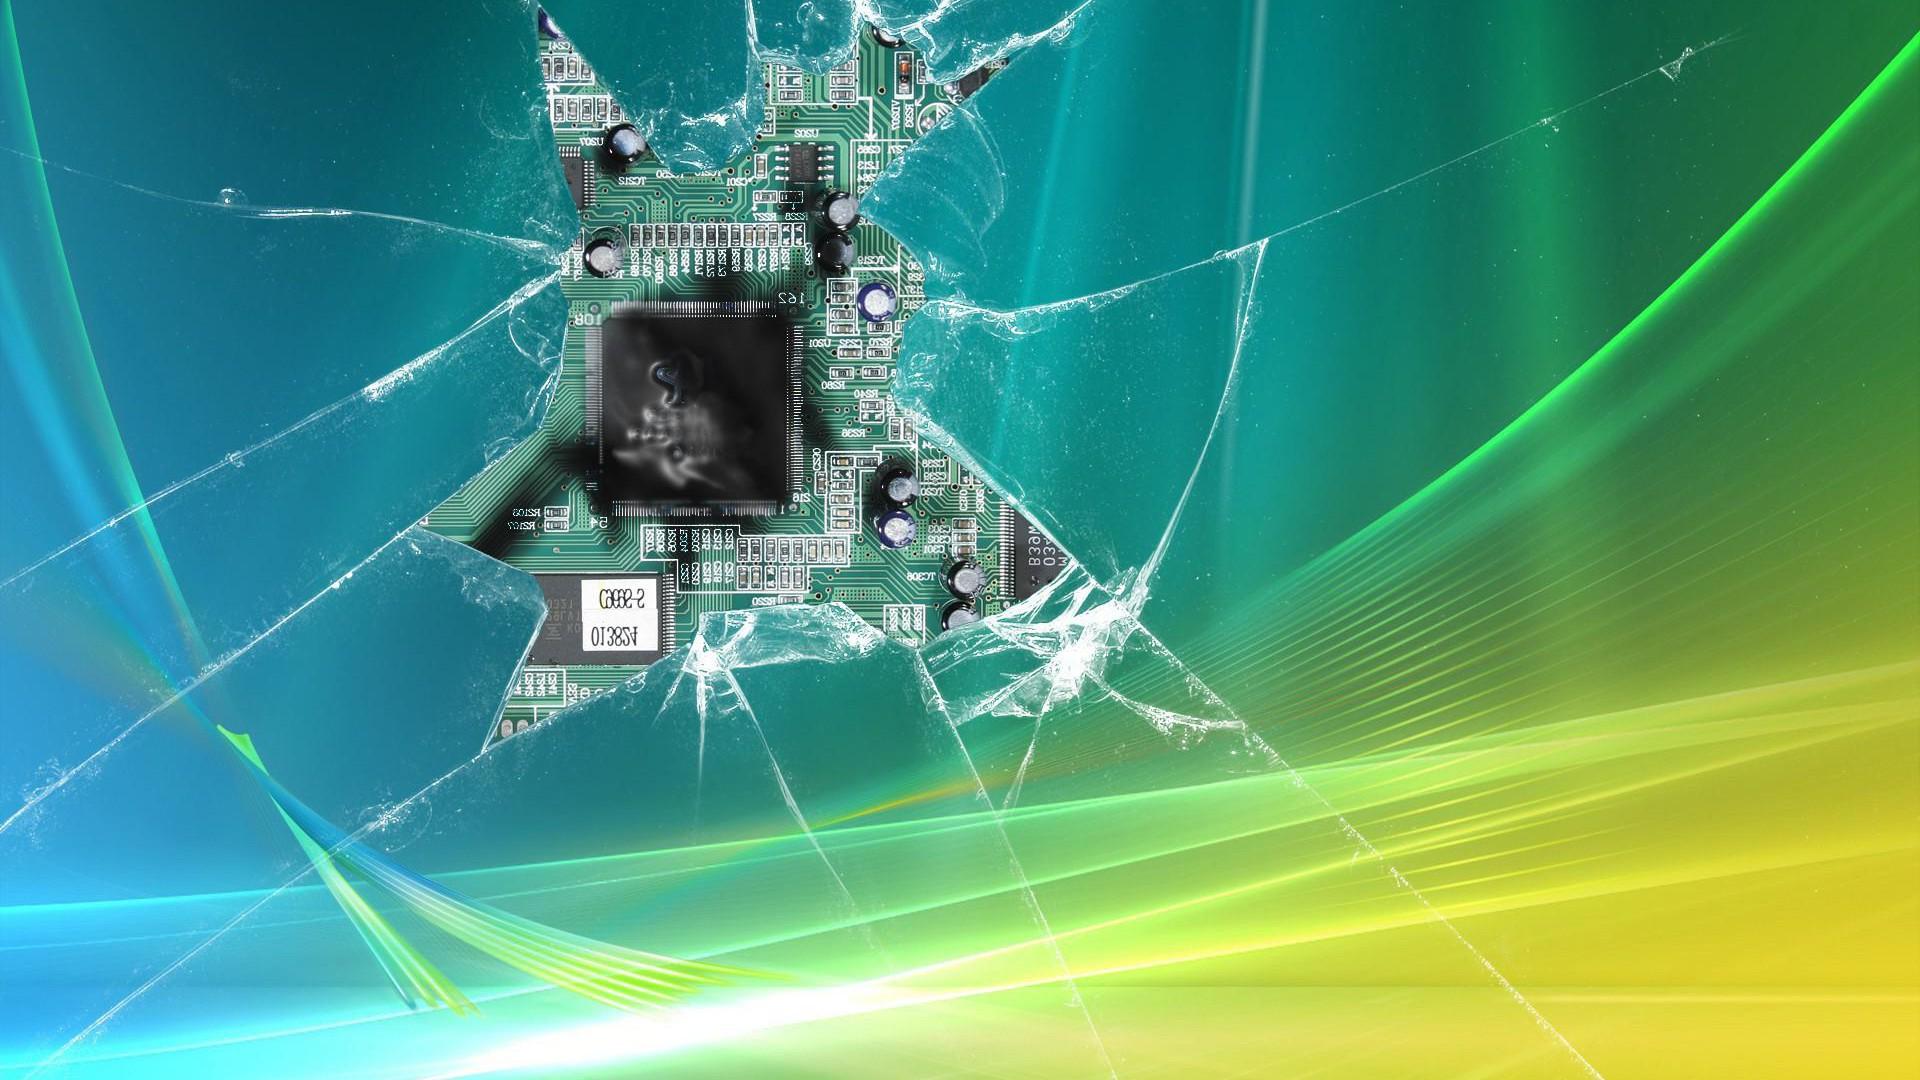 Cracked Screen Windows Vista Exclusive HD Wallpapers 2264 1920x1080